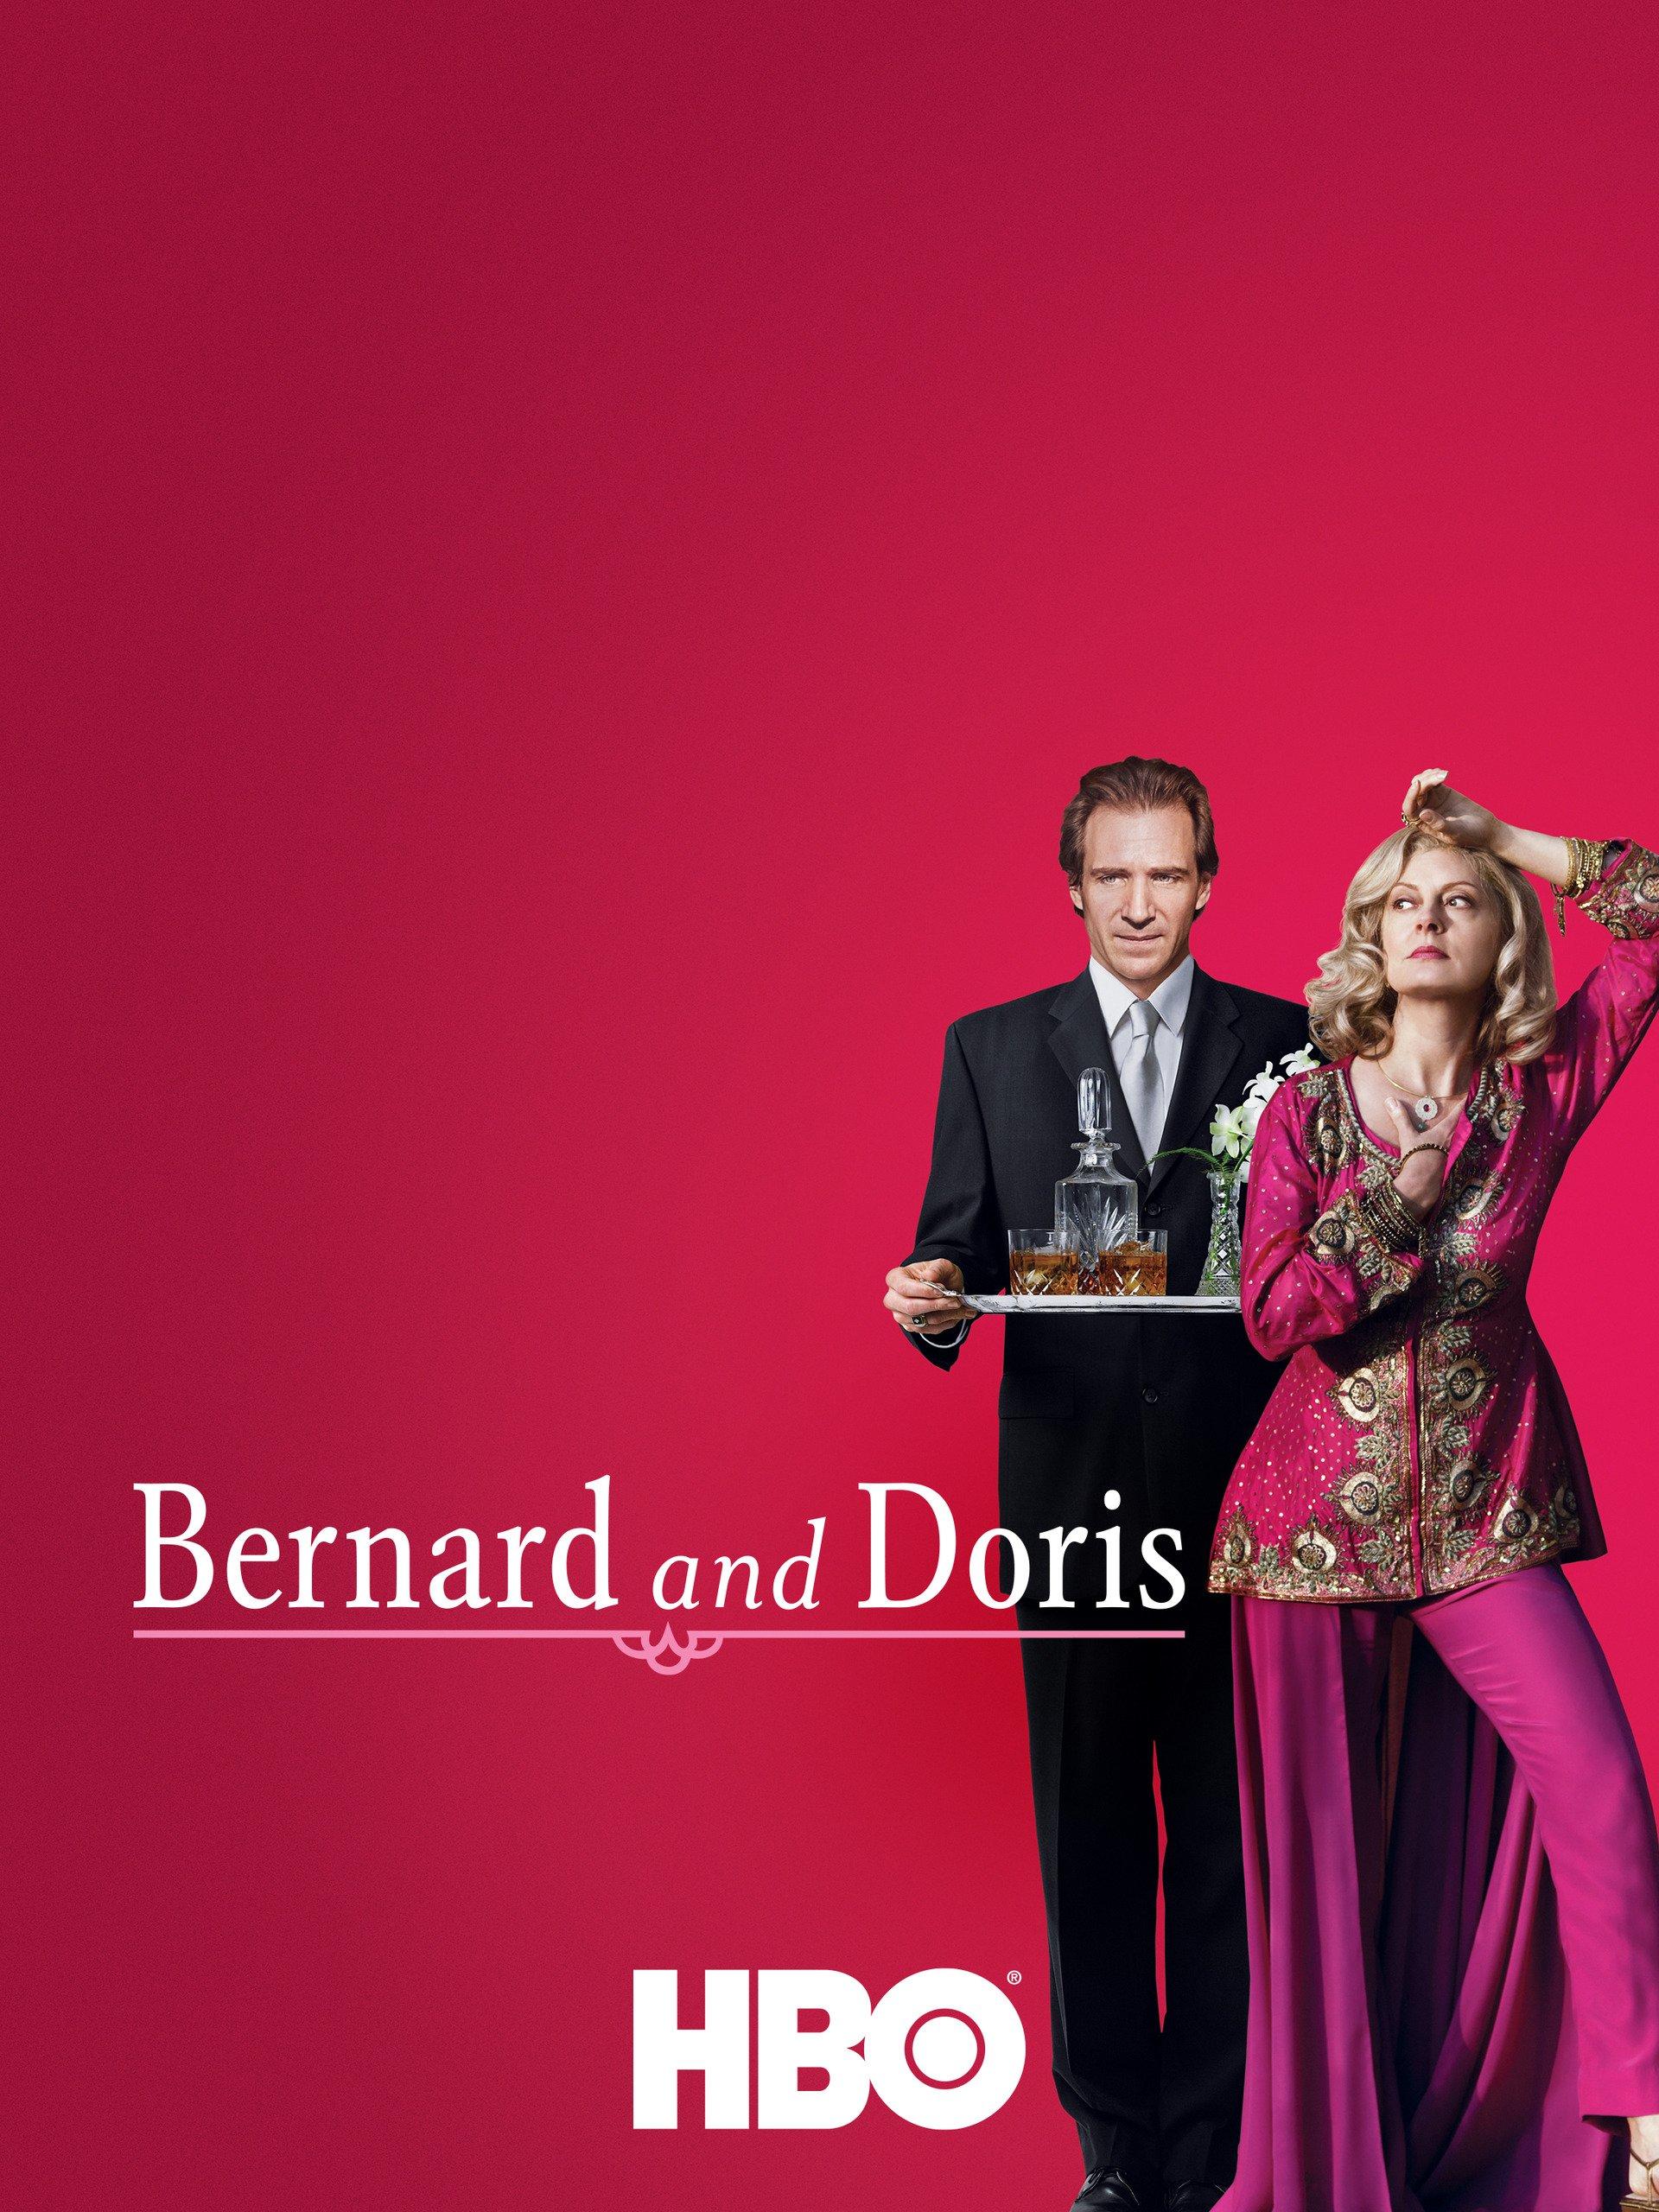 Amazon Bernard And Doris Susan Sarandon Ralph Fiennes James Rebhorn Nick Rolfe Digital Services LLC